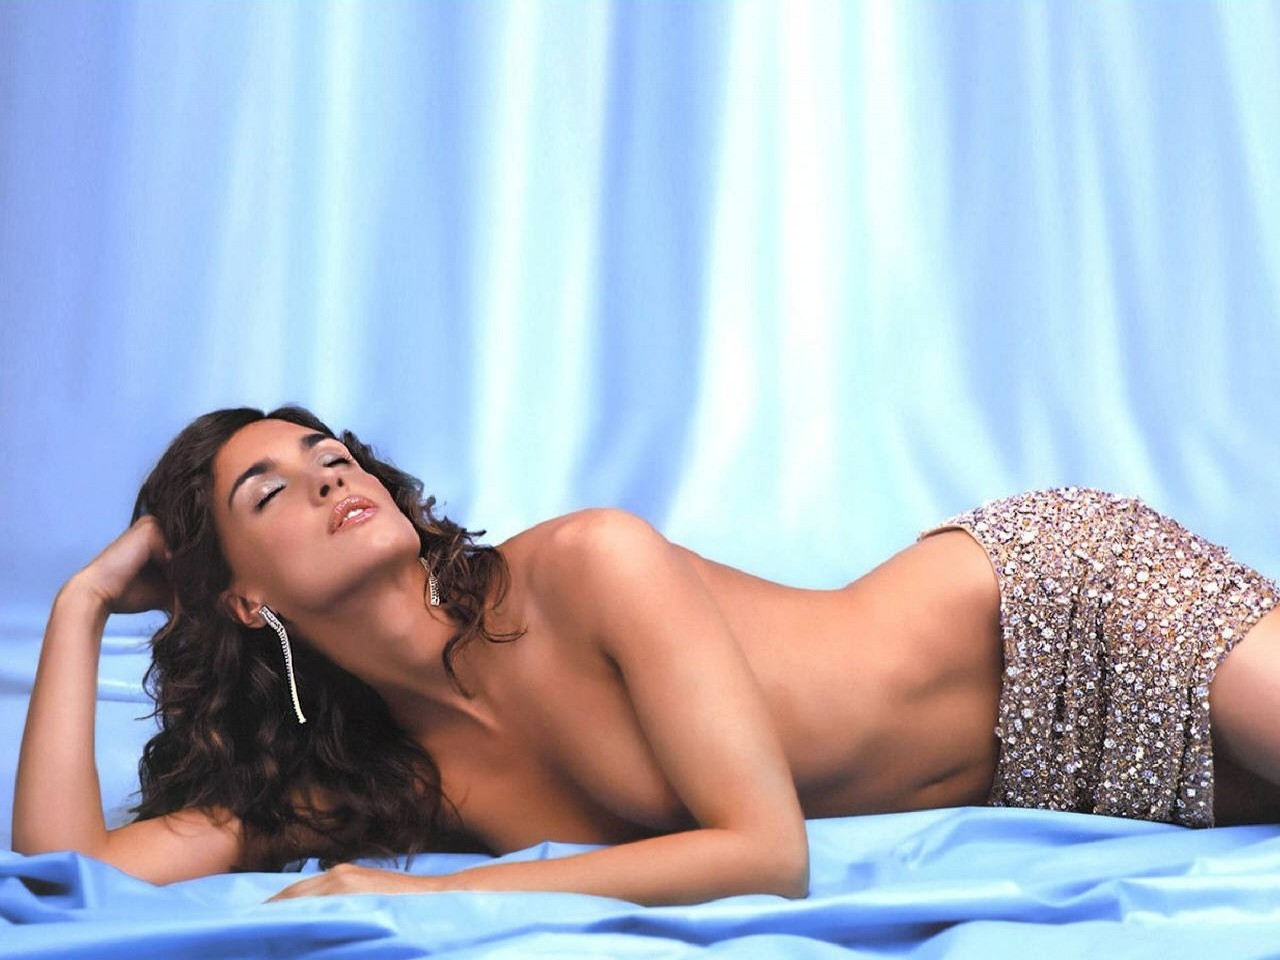 Un sensuale wallpaper di Paz Vega